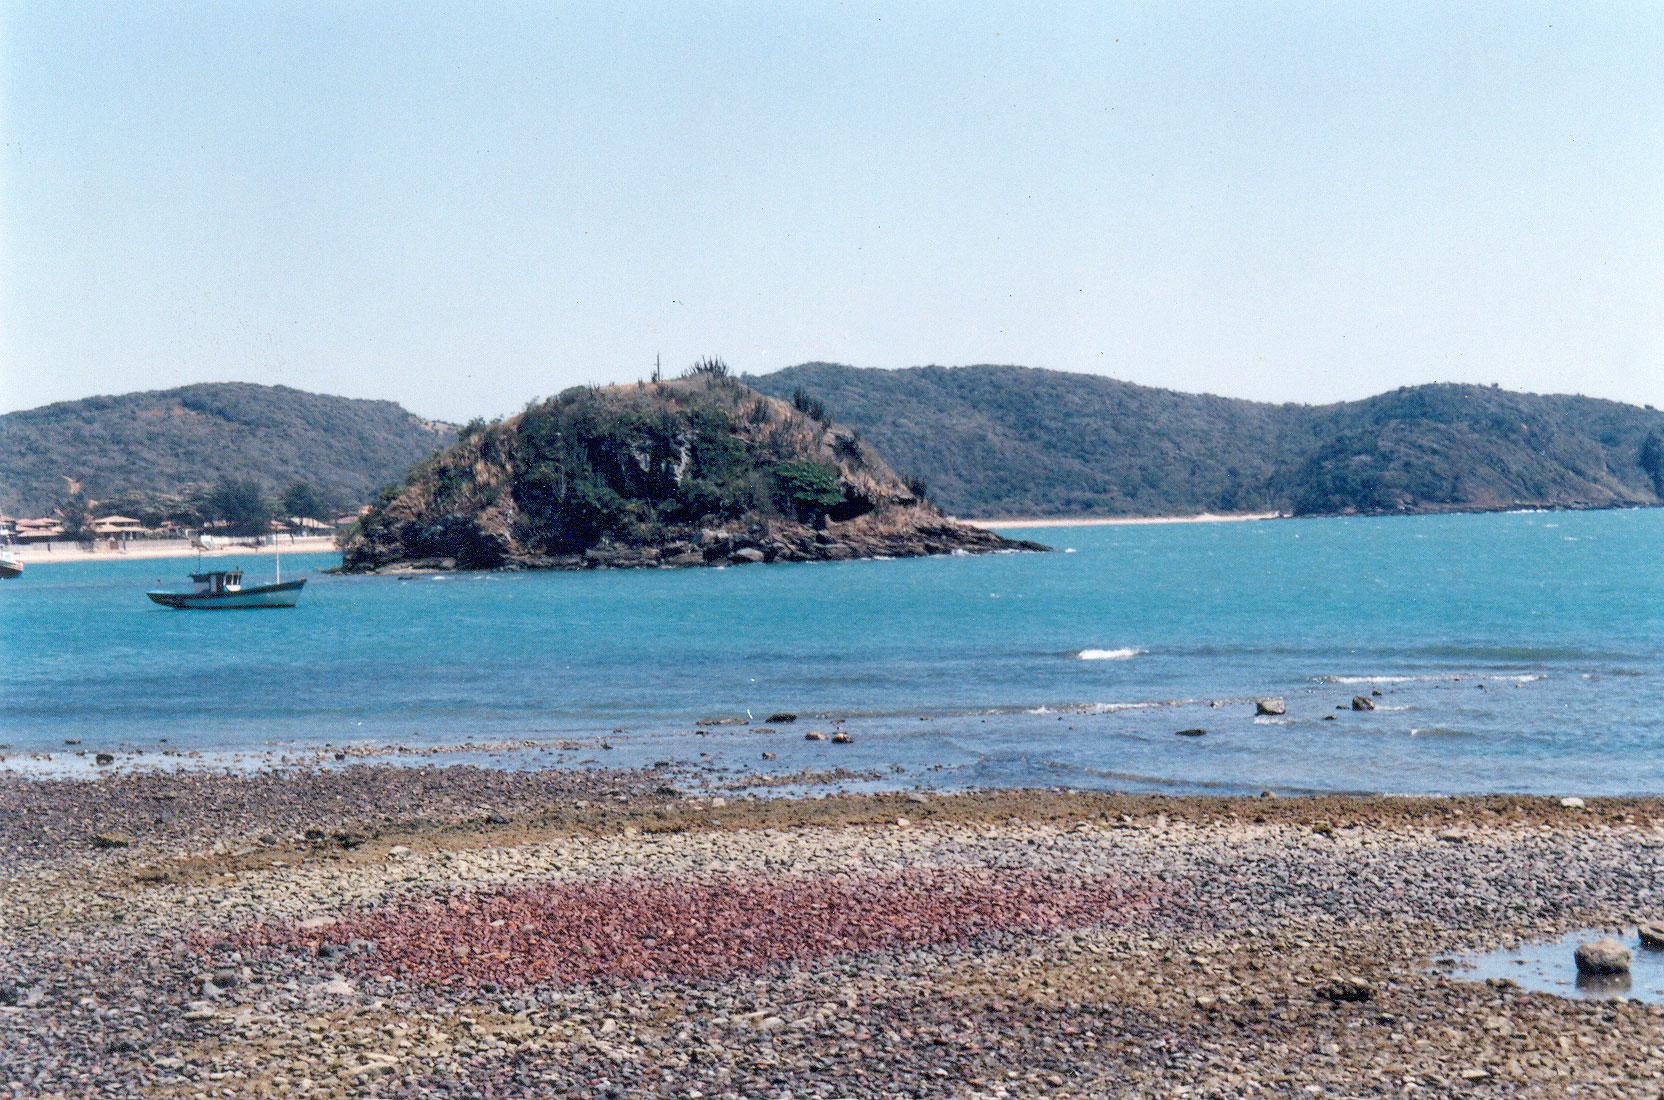 Lagamar - Ilha do Cardoso